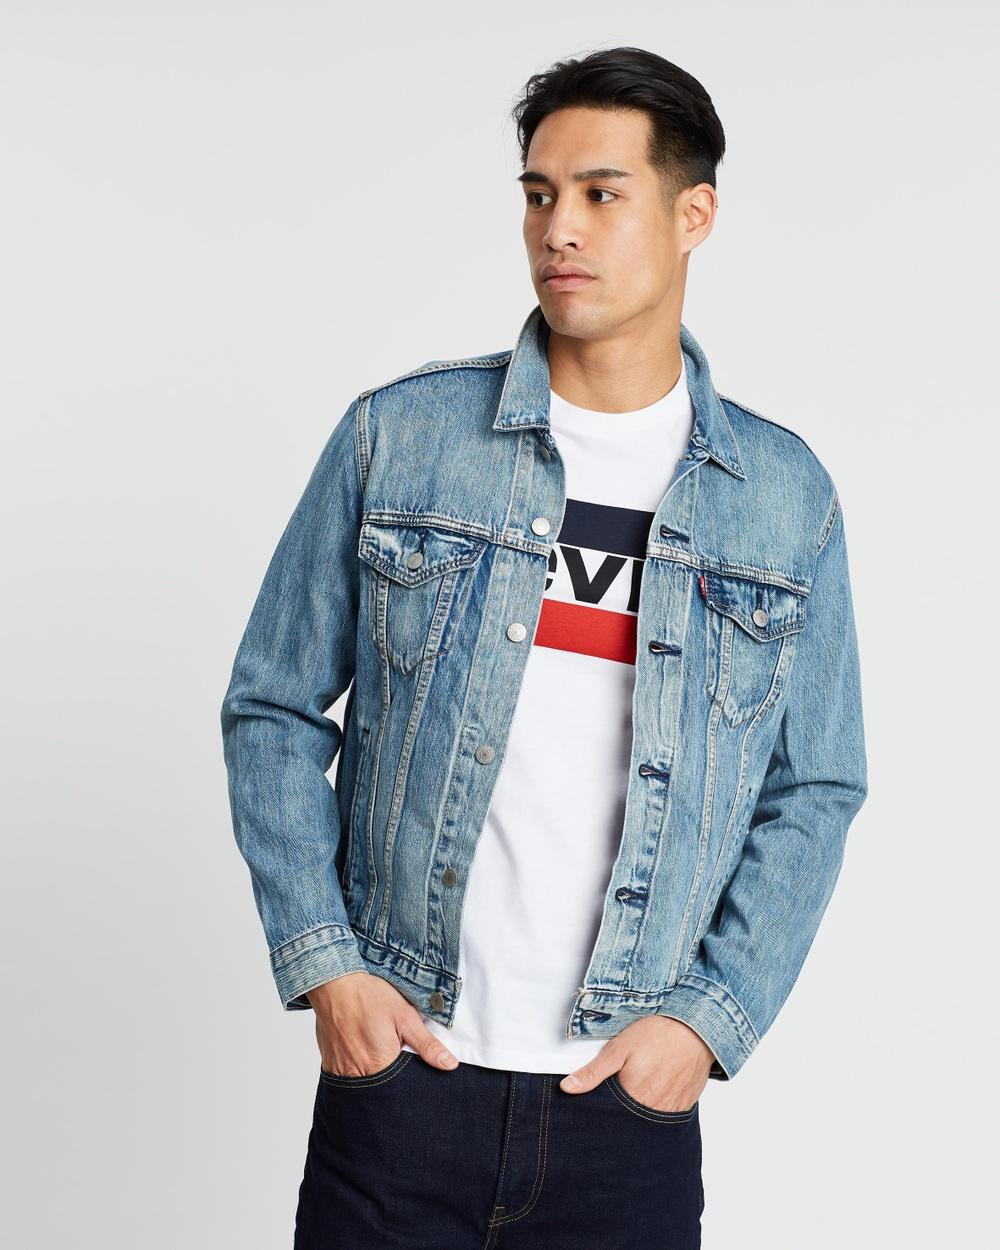 Levi's The Trucker Jacket Denim jacket Killbrew Trucker Australia